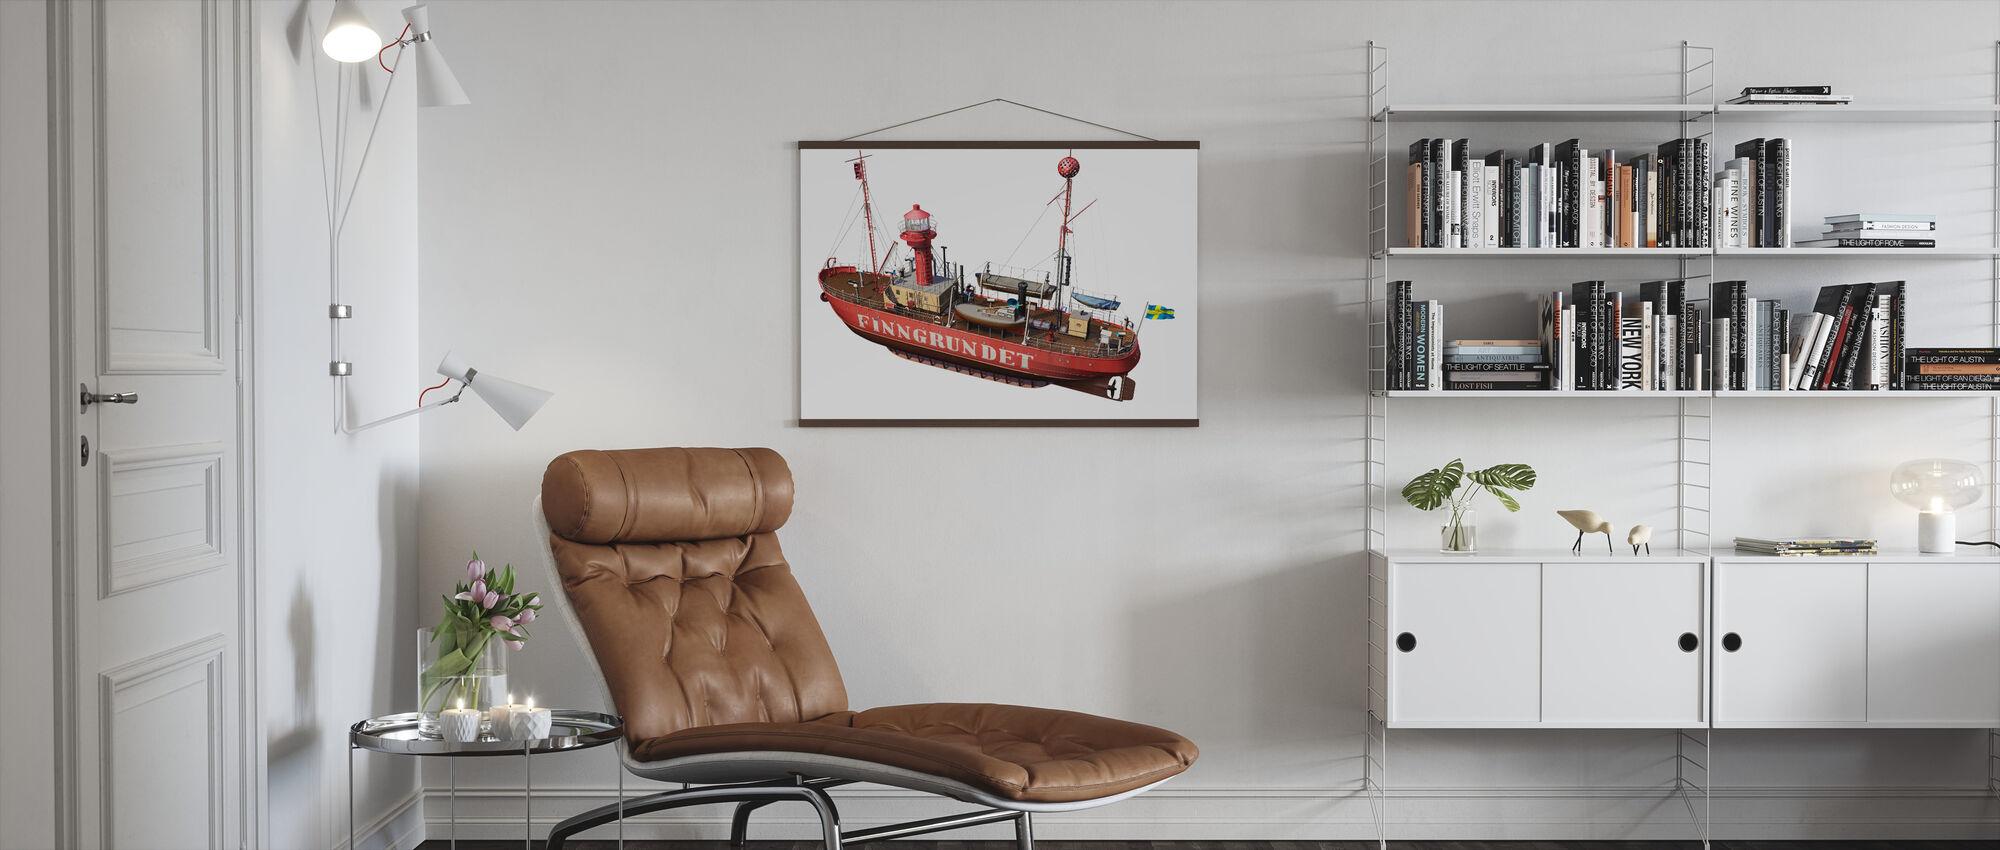 The lighthouse Finngrunget - Poster - Living Room